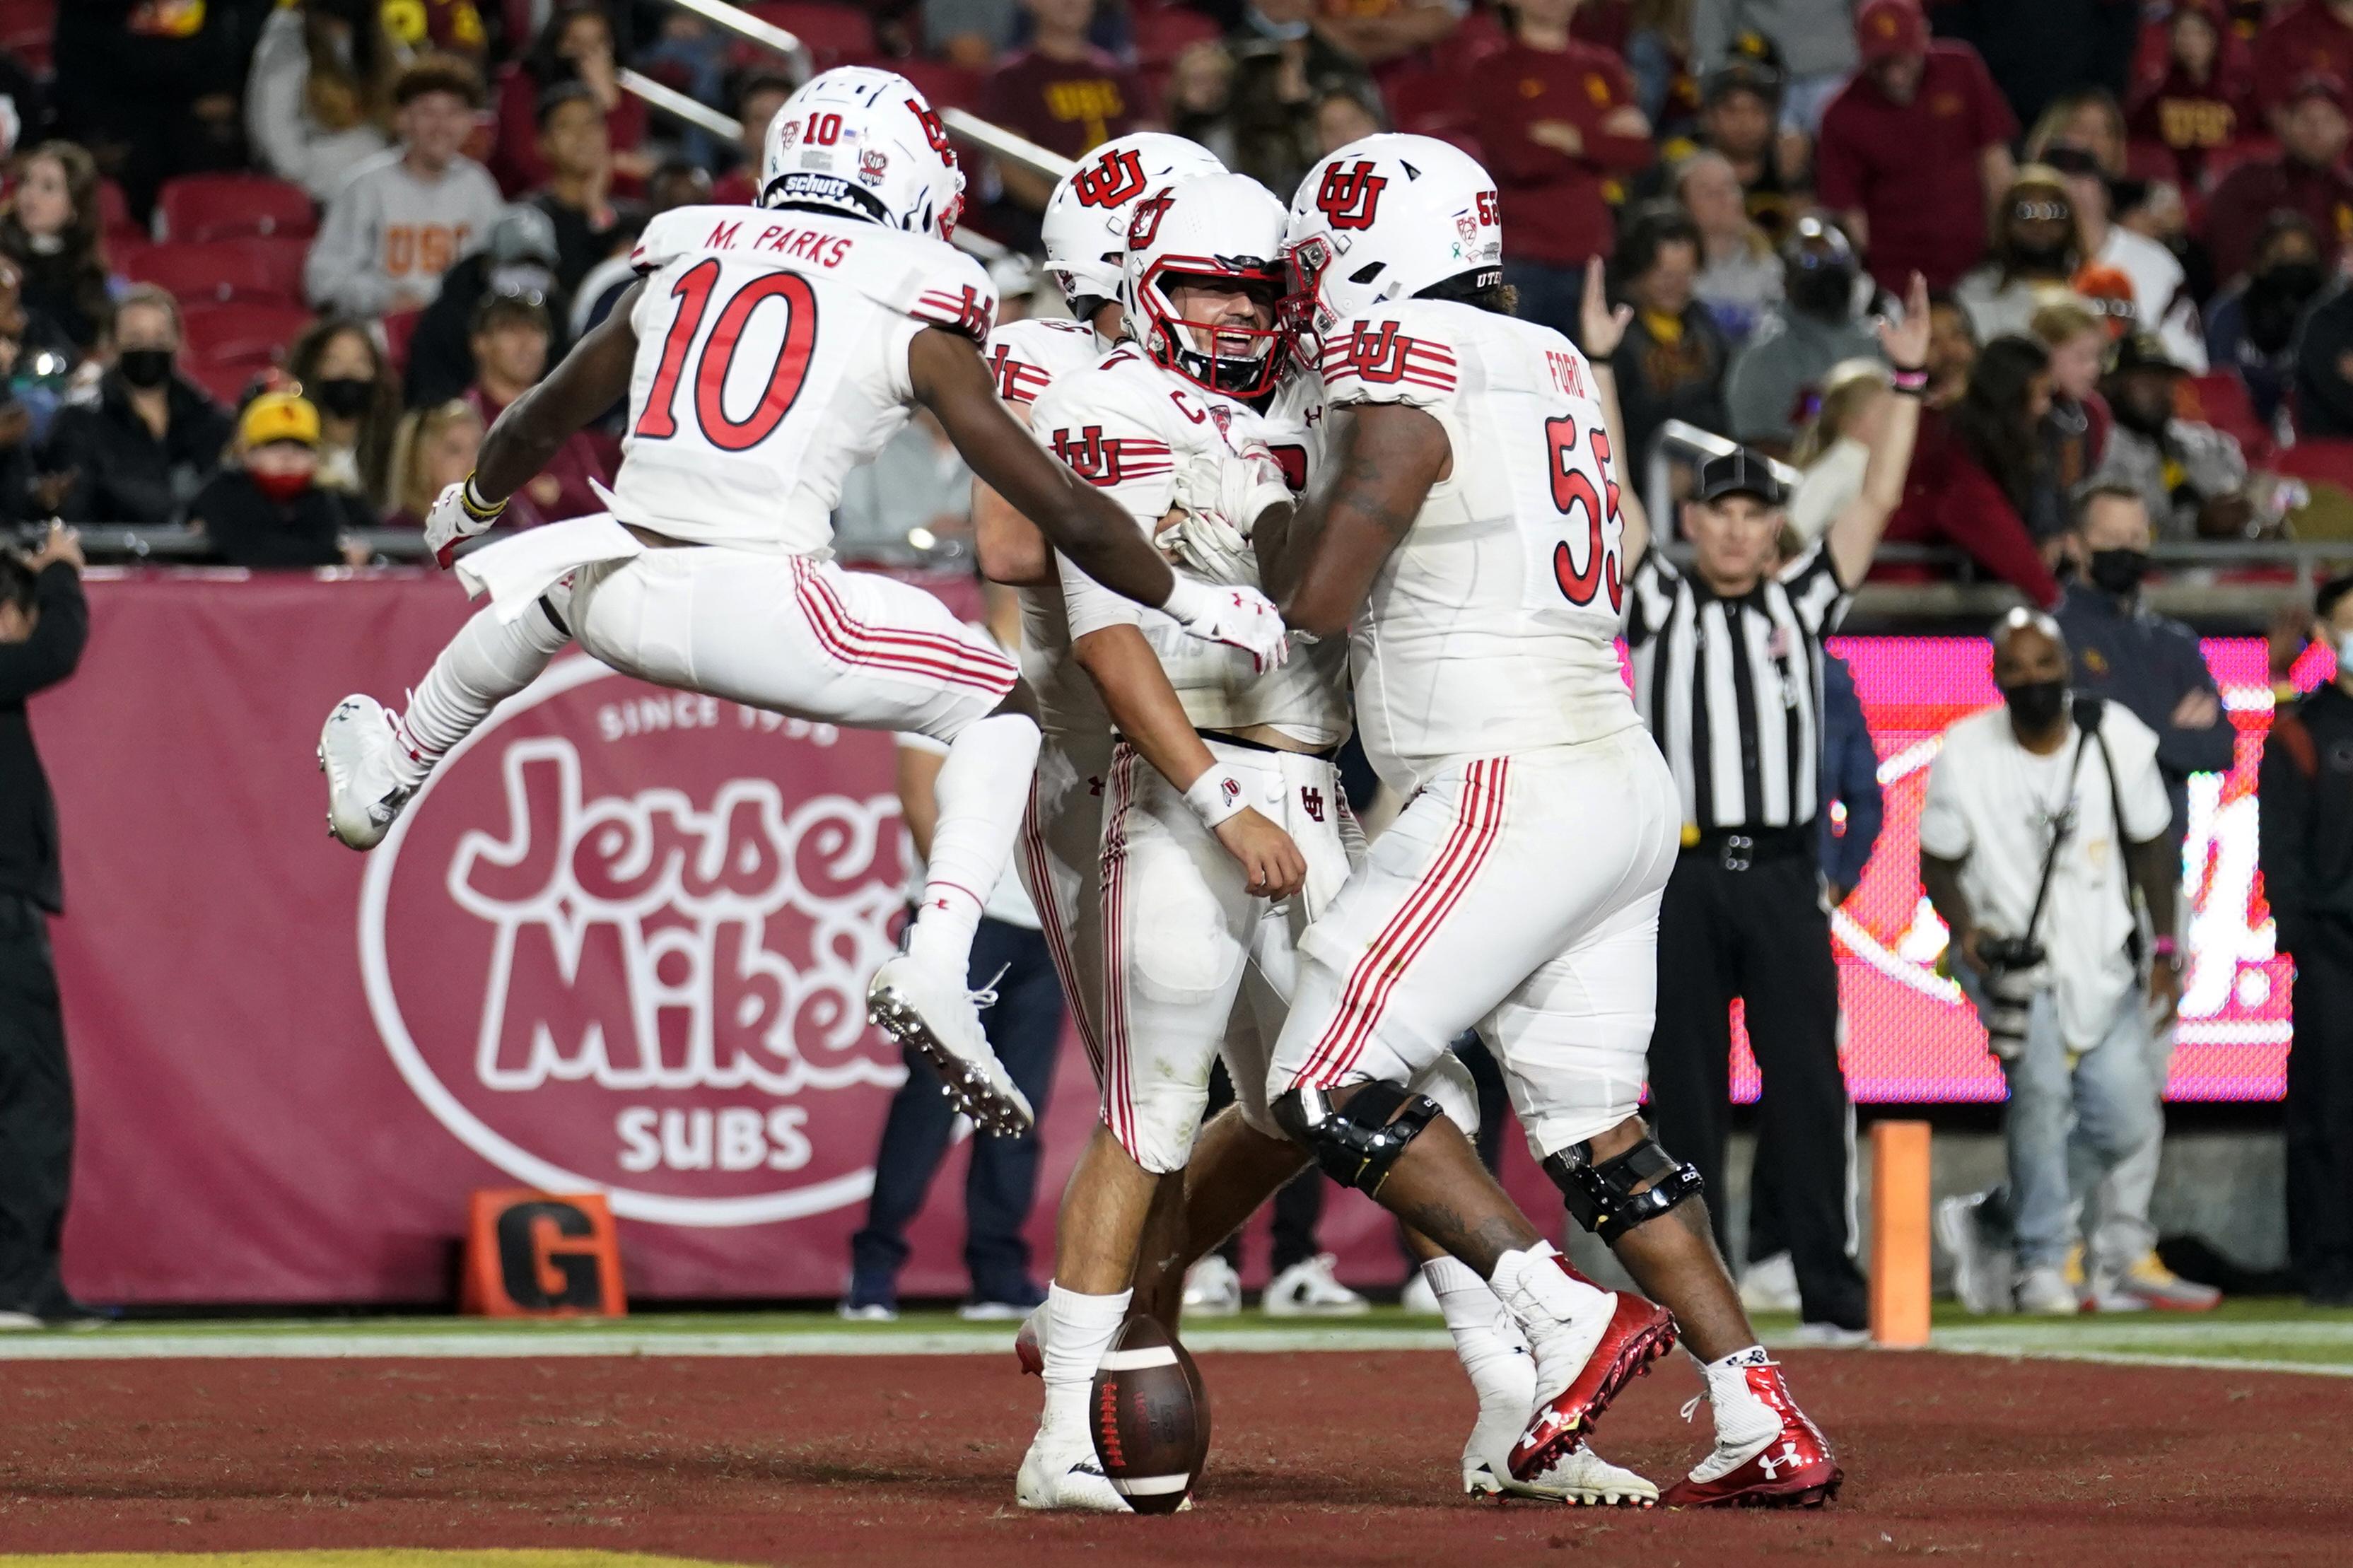 Utah quarterback Cameron Rising jumps up to celebrates his rushing touchdown with teammates.